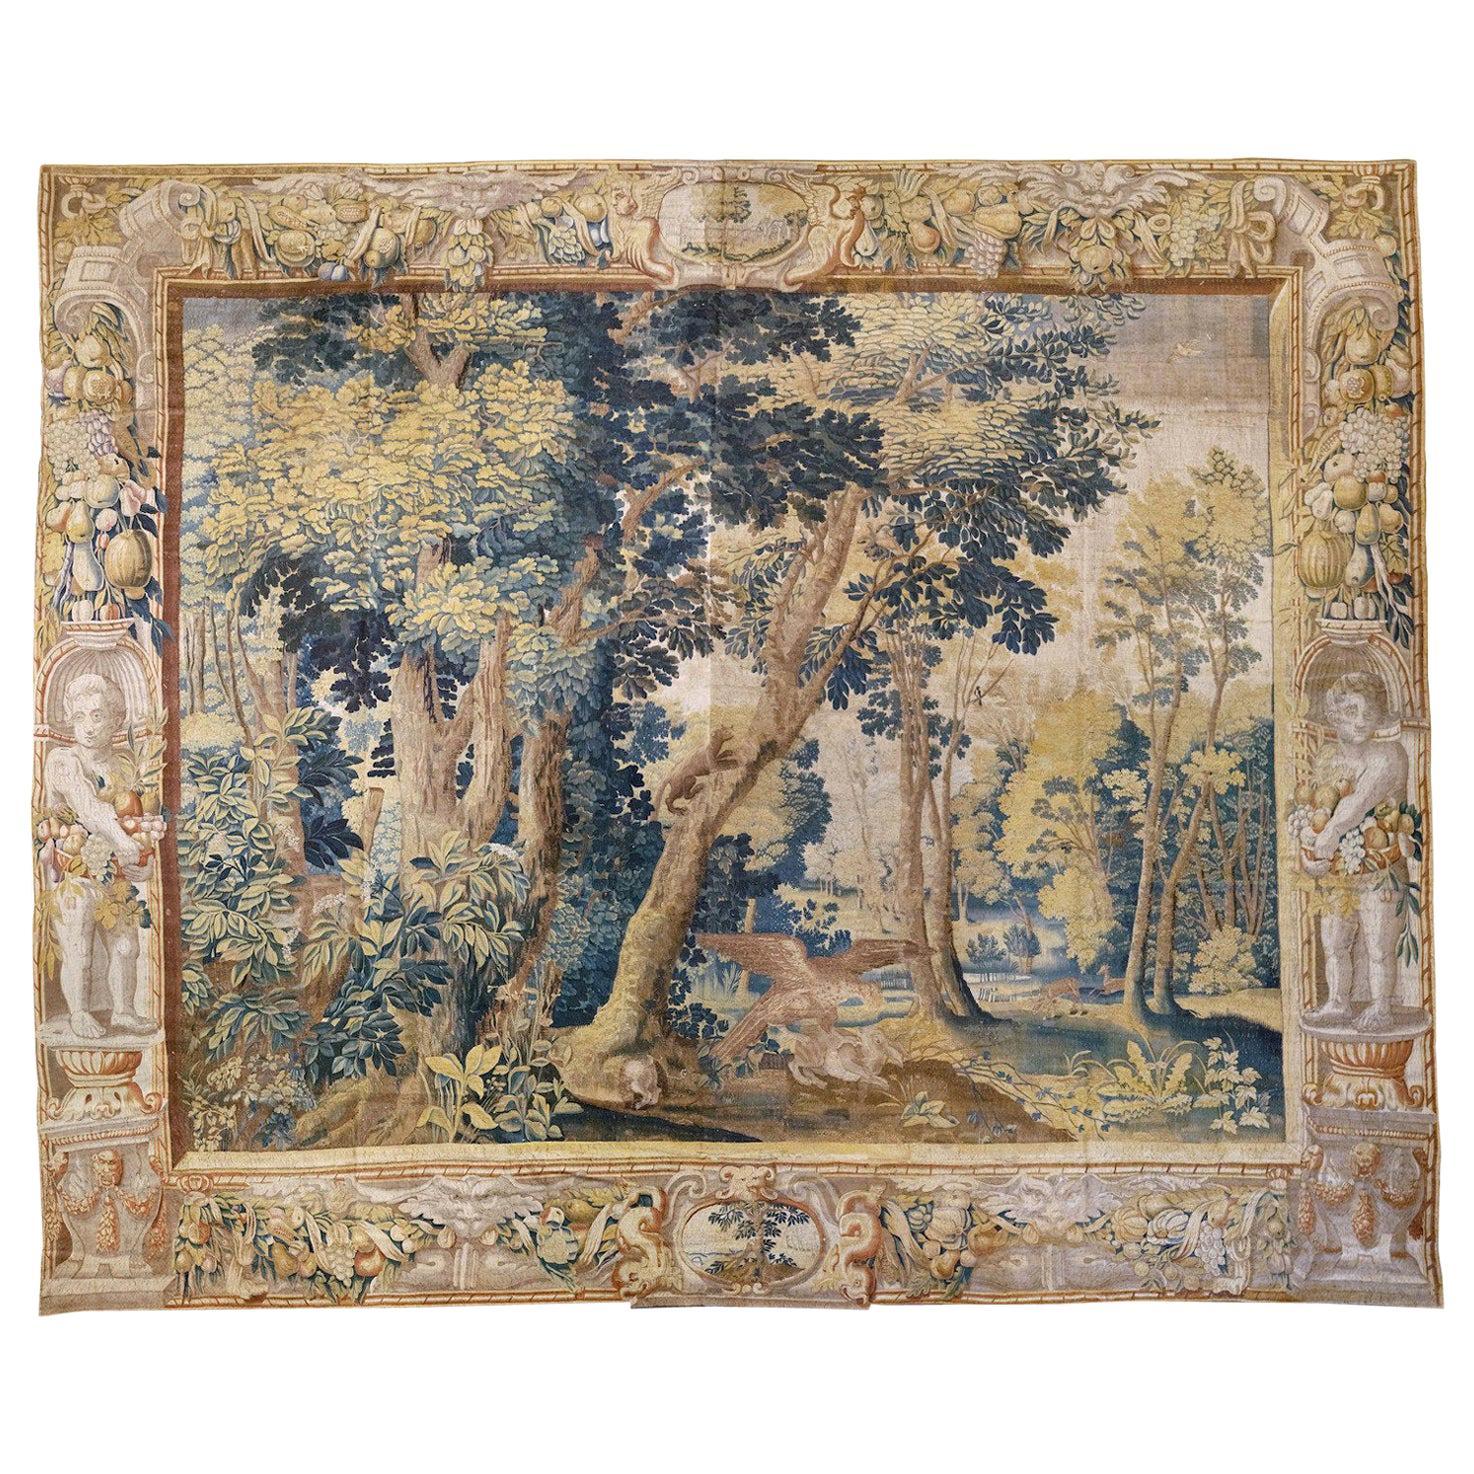 Antique Late 17th Century Antique Franco-Flemish Verdure Landscape Tapestry